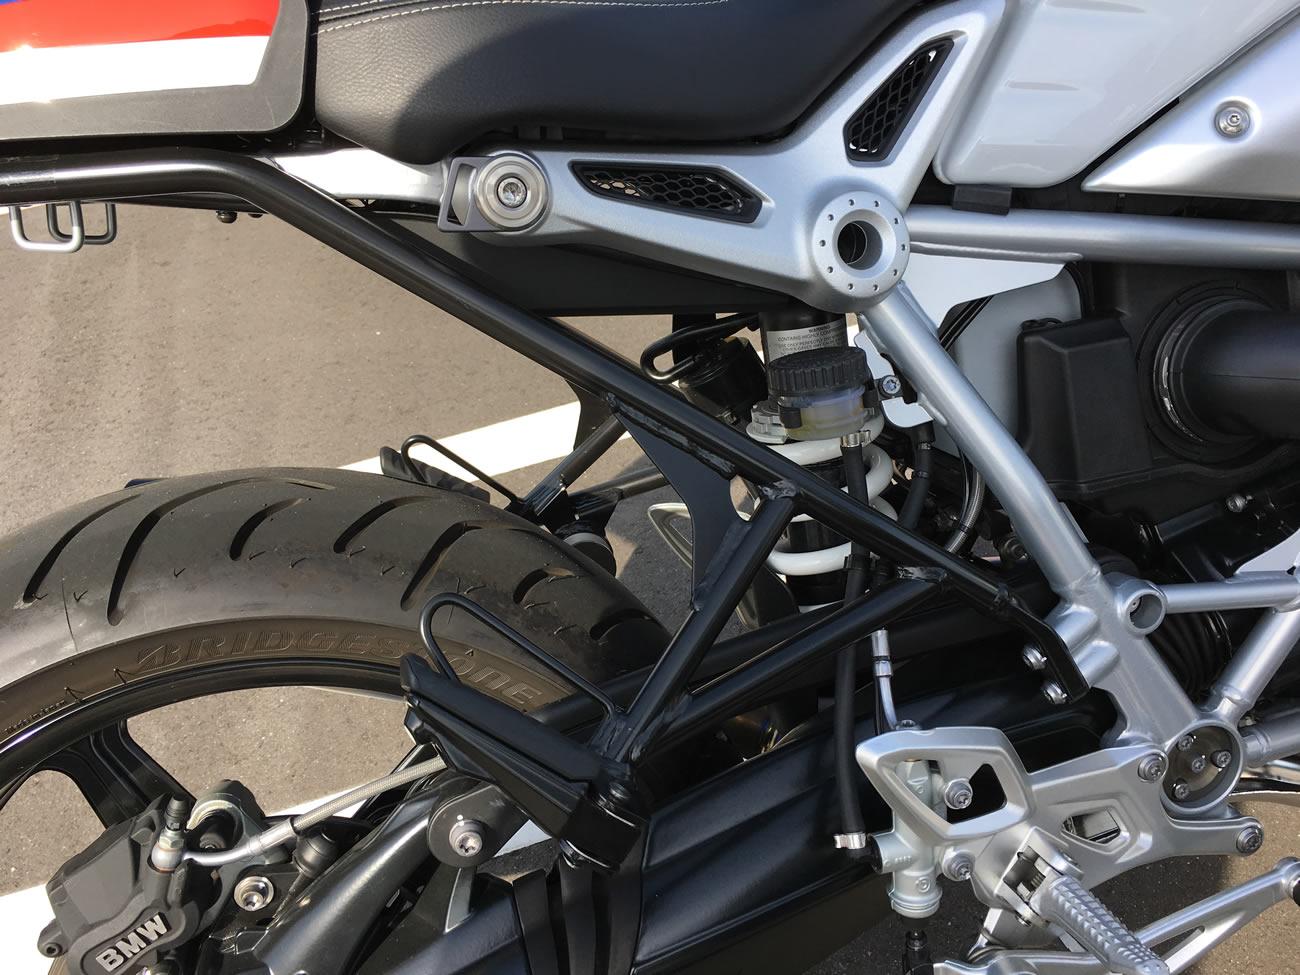 R nineT racer(BMW)のタンデムステップノーマル